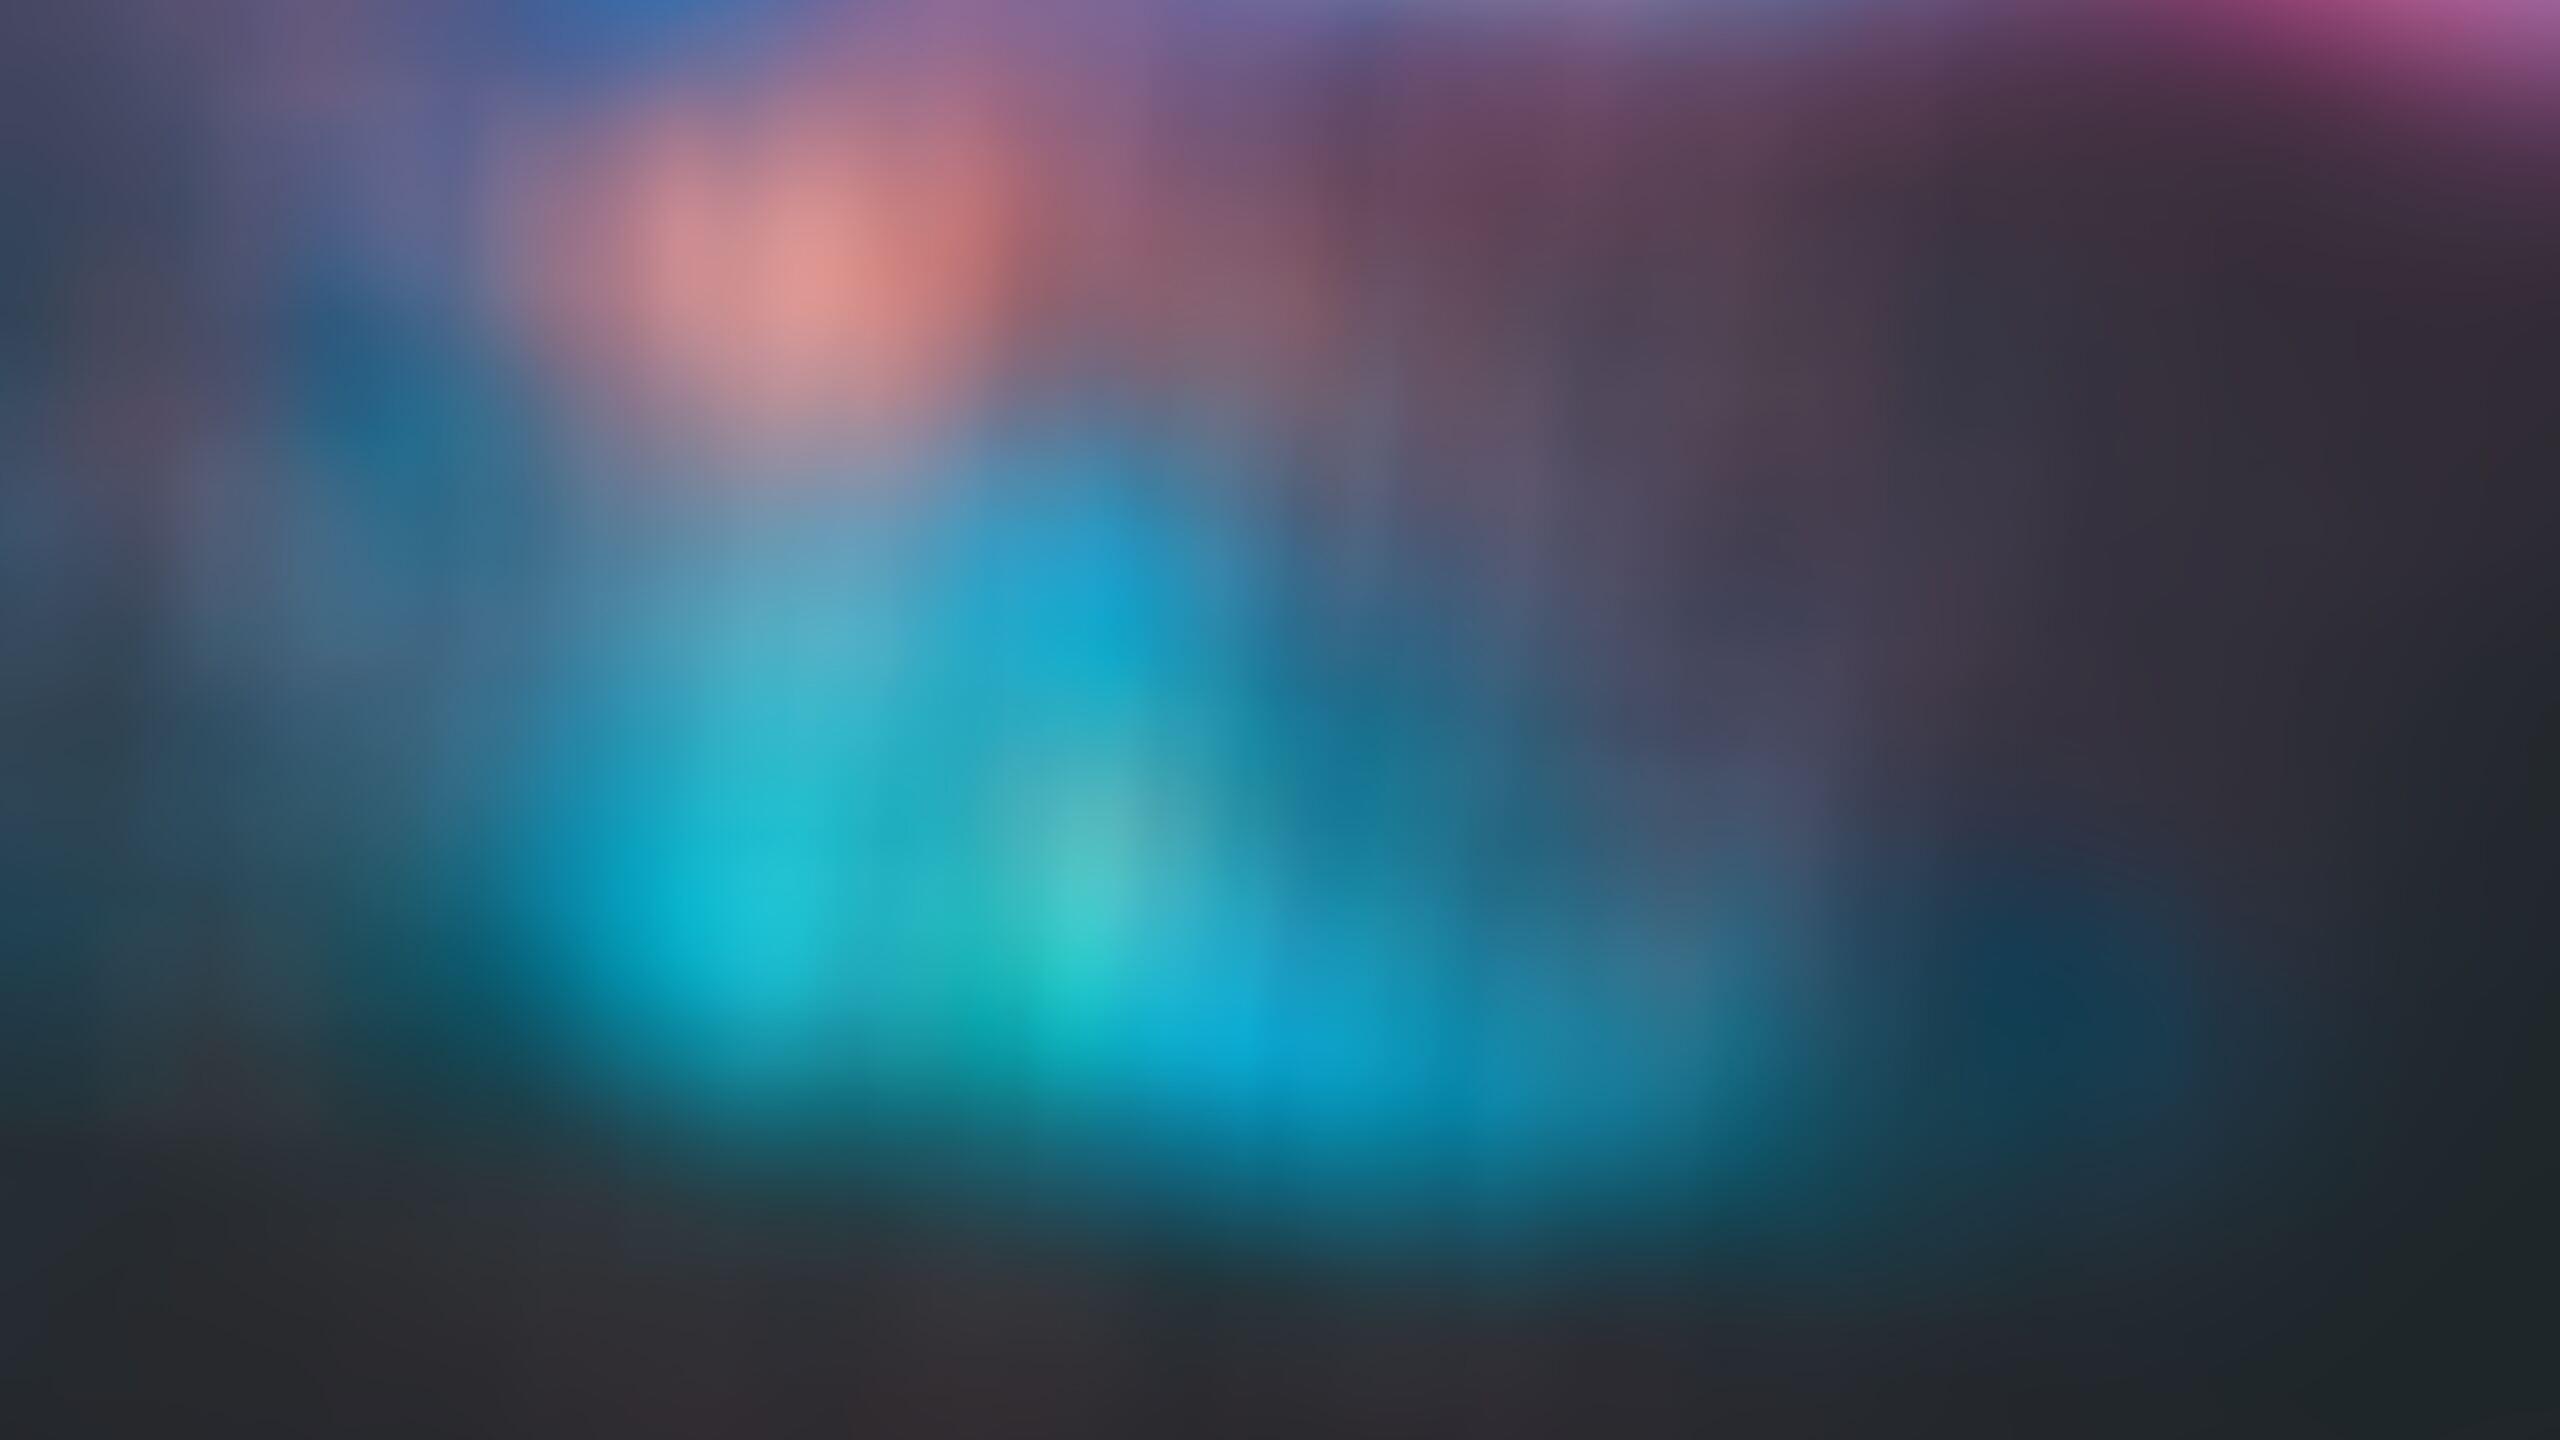 2560x1440 Blur Blue Gradient Cool Background 1440p